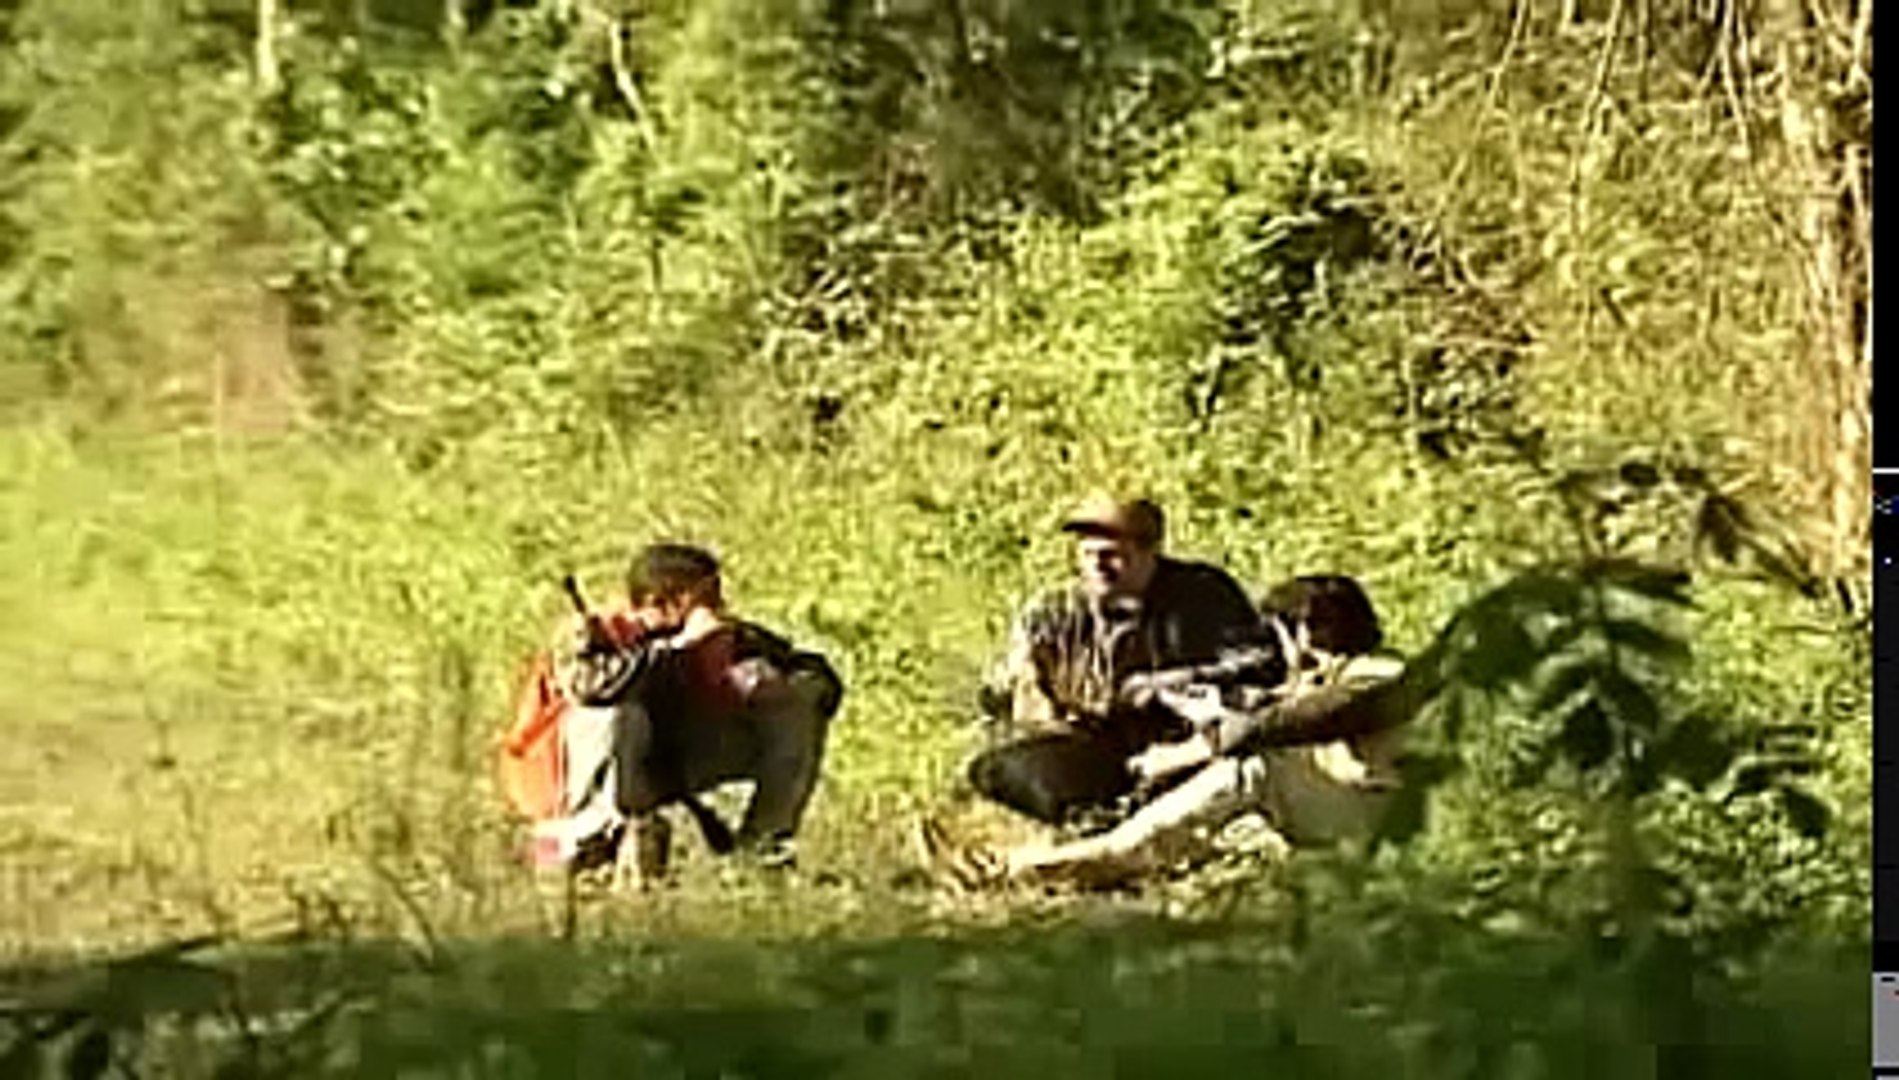 Serial Killers - Thomas Lee Dillon (Sniper Killer) - Documentary